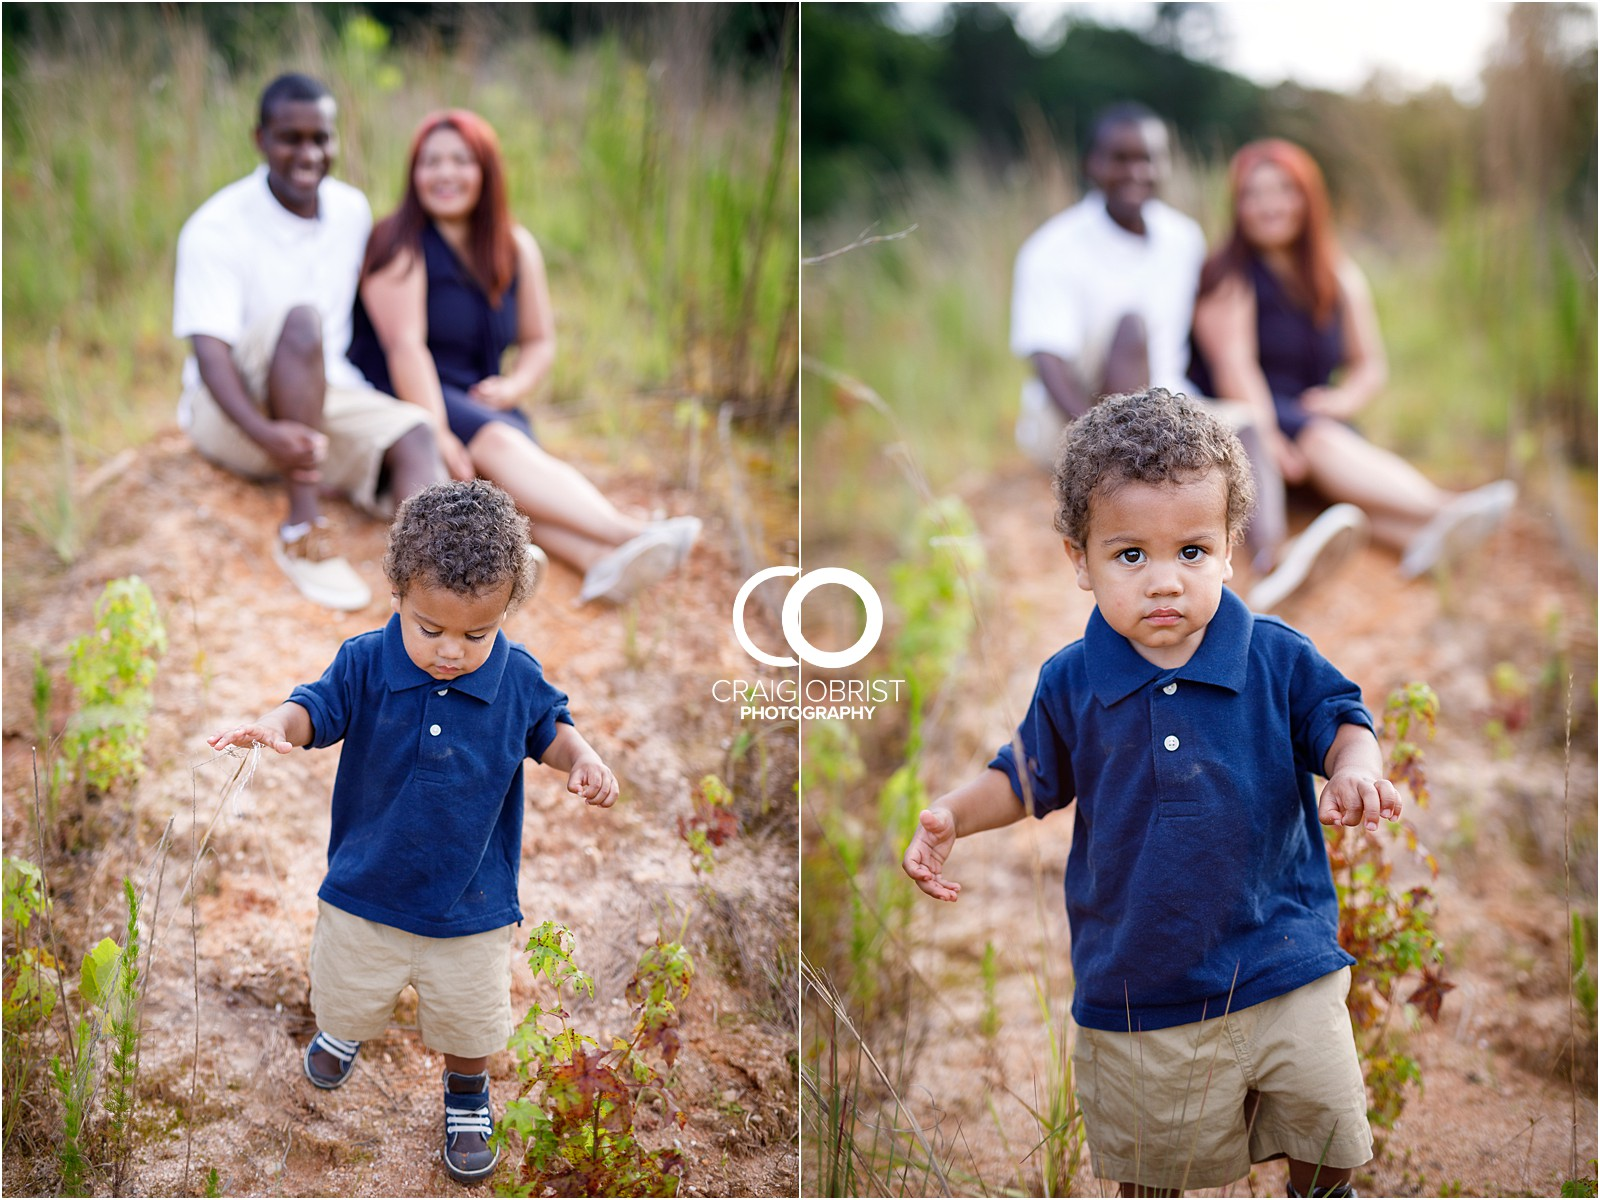 Grass Field Family Portratis Sunset Atlanta_0027.jpg